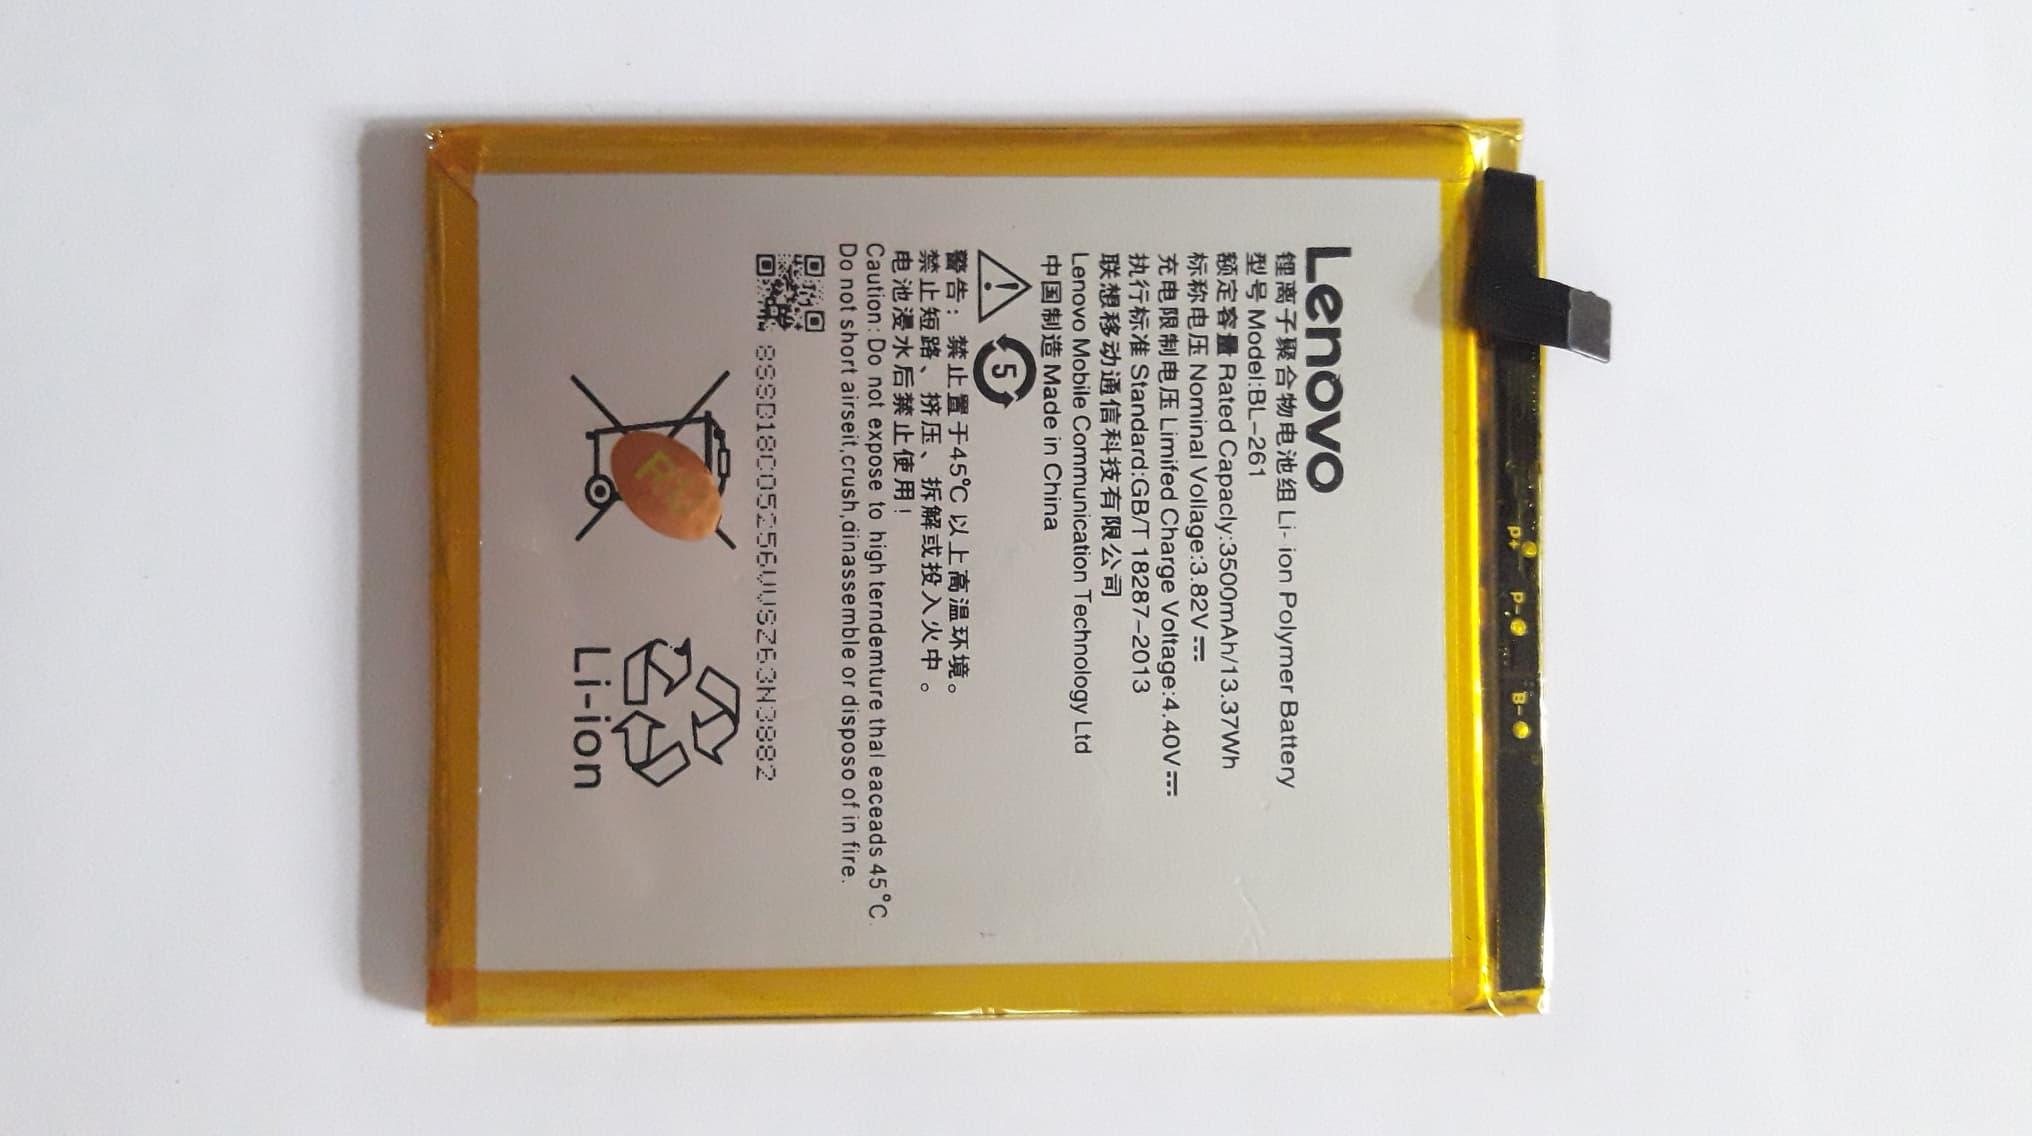 Battery Lenovo K5 Note A7020 BL 261 รับประกันคุณภาพนาน 3 เดือน